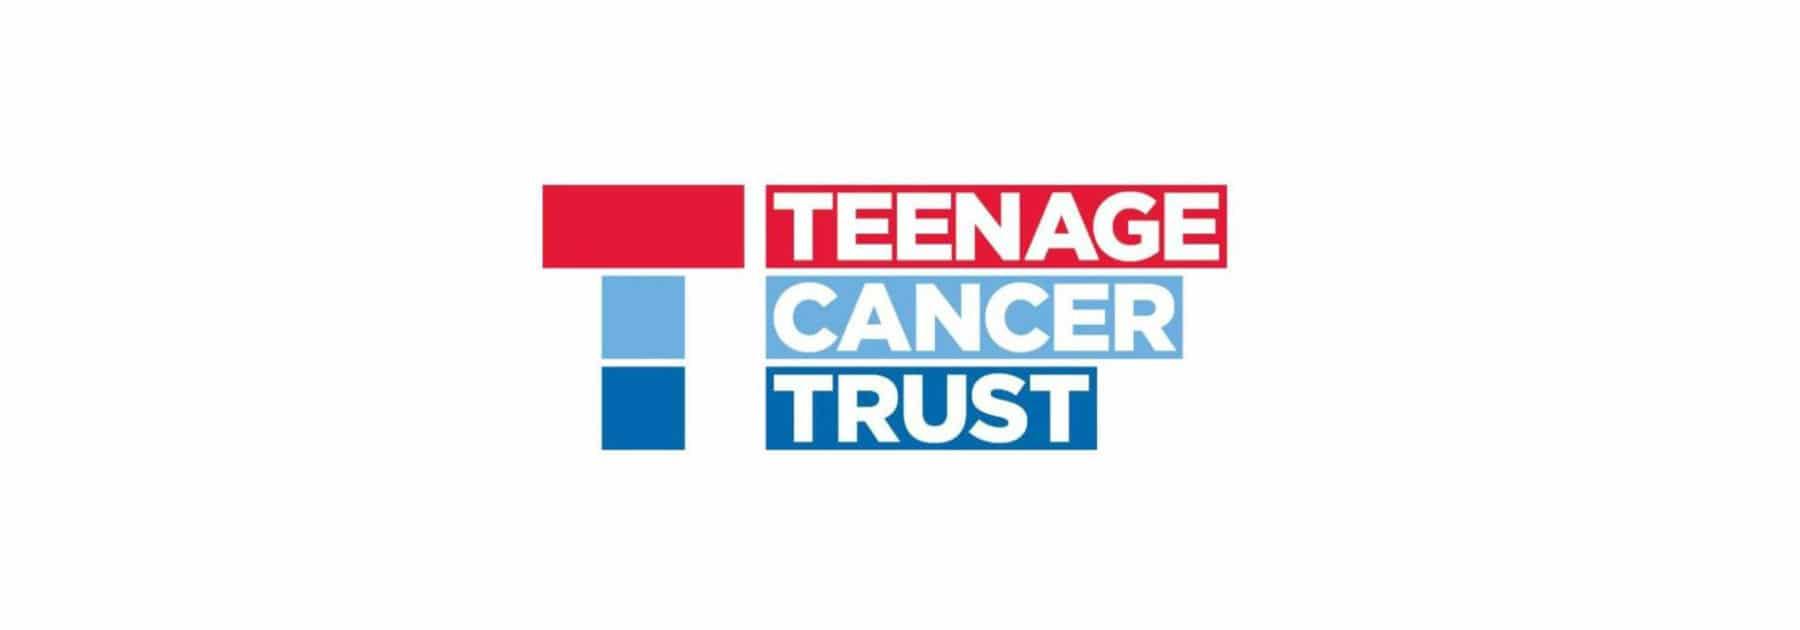 Teenage Cancer Trust Fundraising